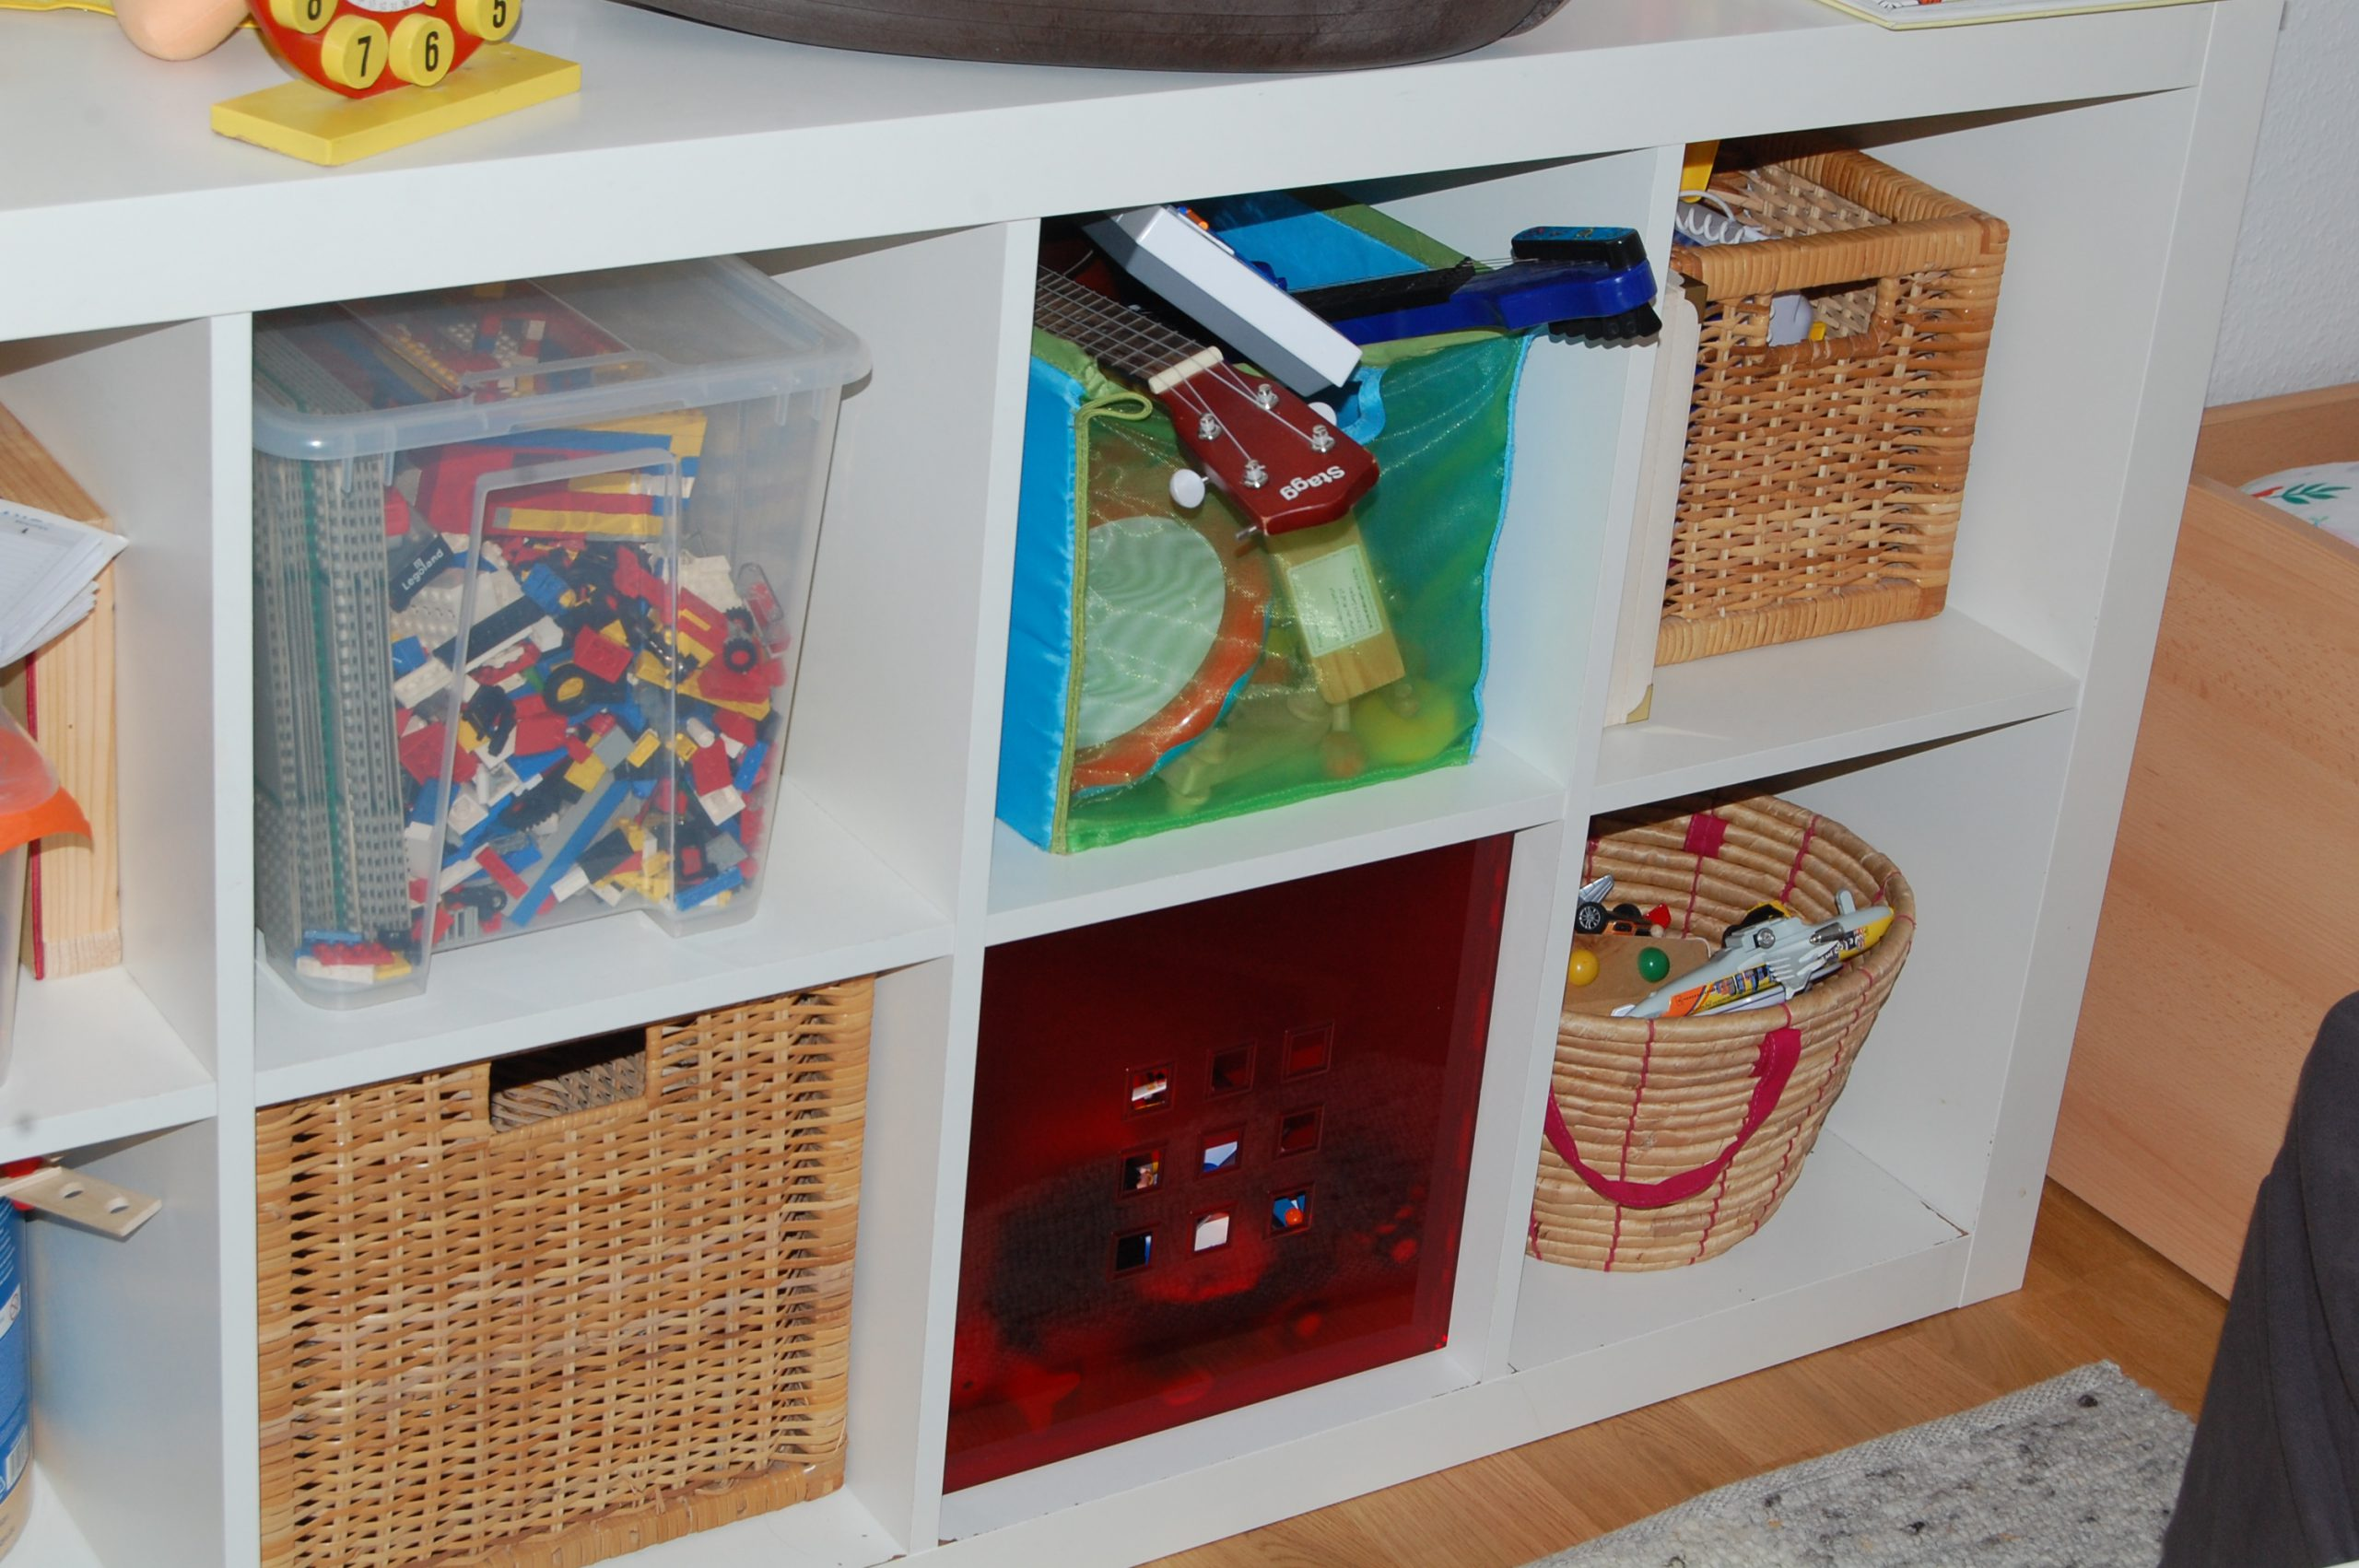 ordnung halten mit kindern heute ist musik. Black Bedroom Furniture Sets. Home Design Ideas